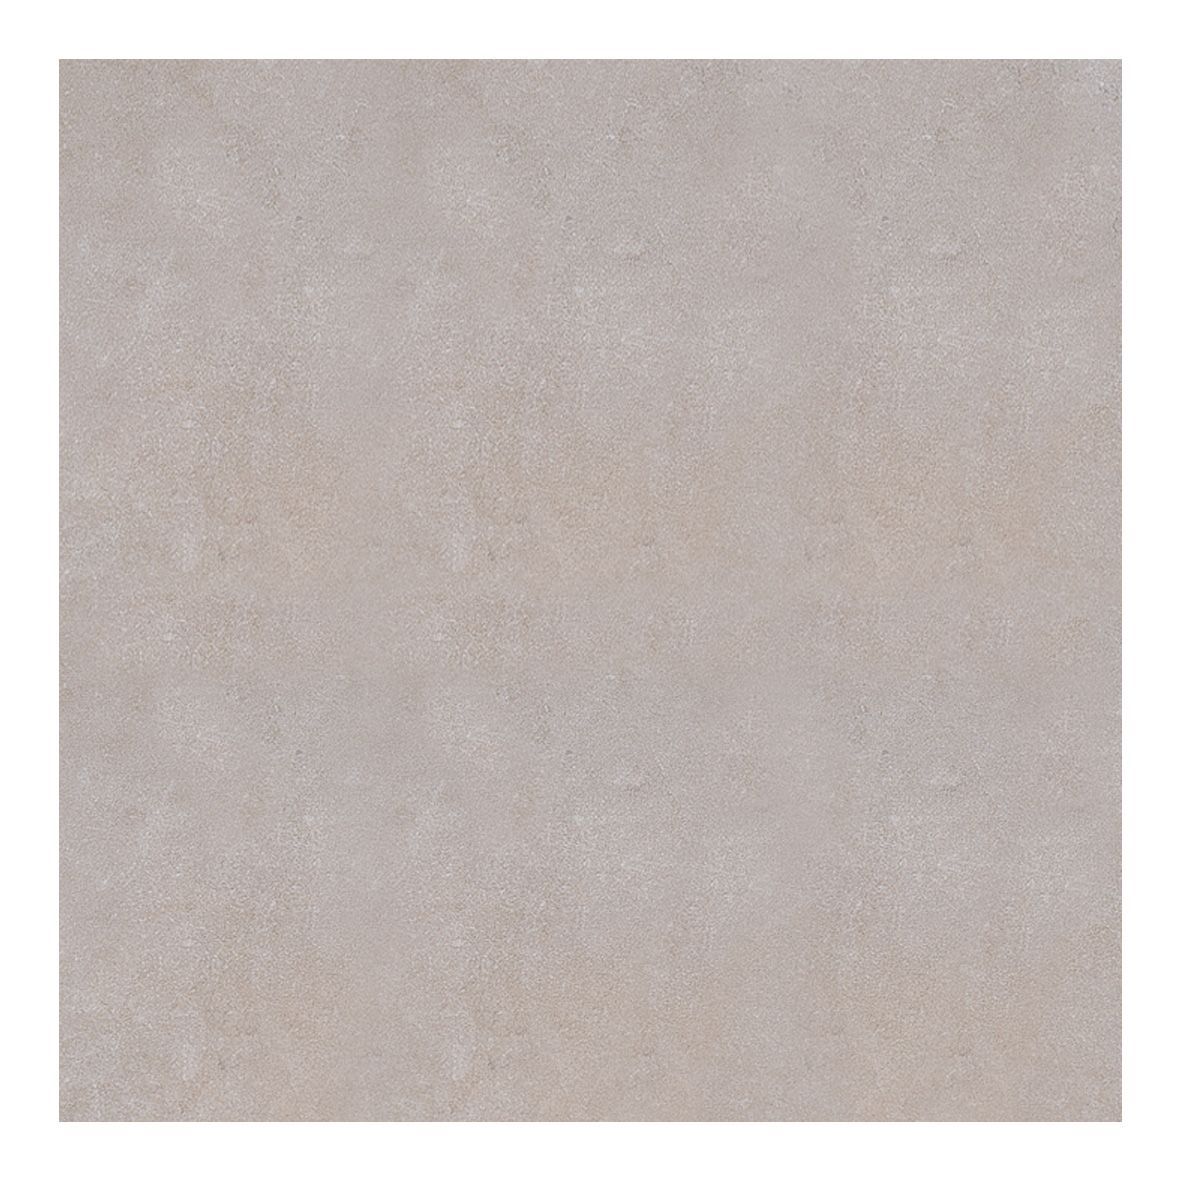 Gemini Young Stone Grey 600x600 Floor Tiles @ CTD